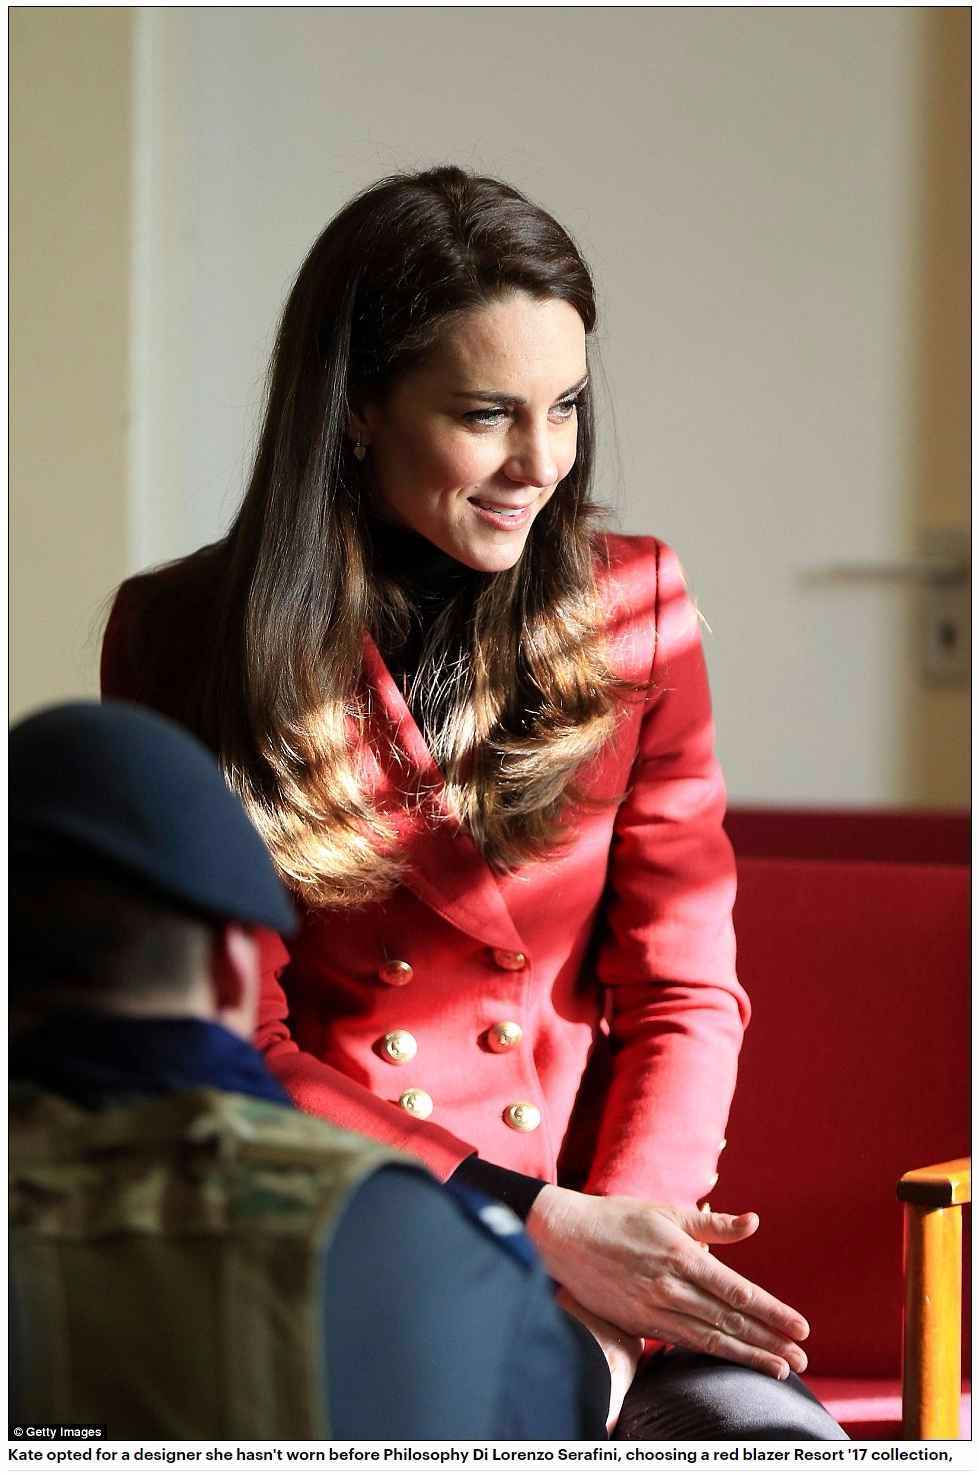 Kate opted for a designer she hasn't worn before Philosophy Di Lorenzo Serafini,